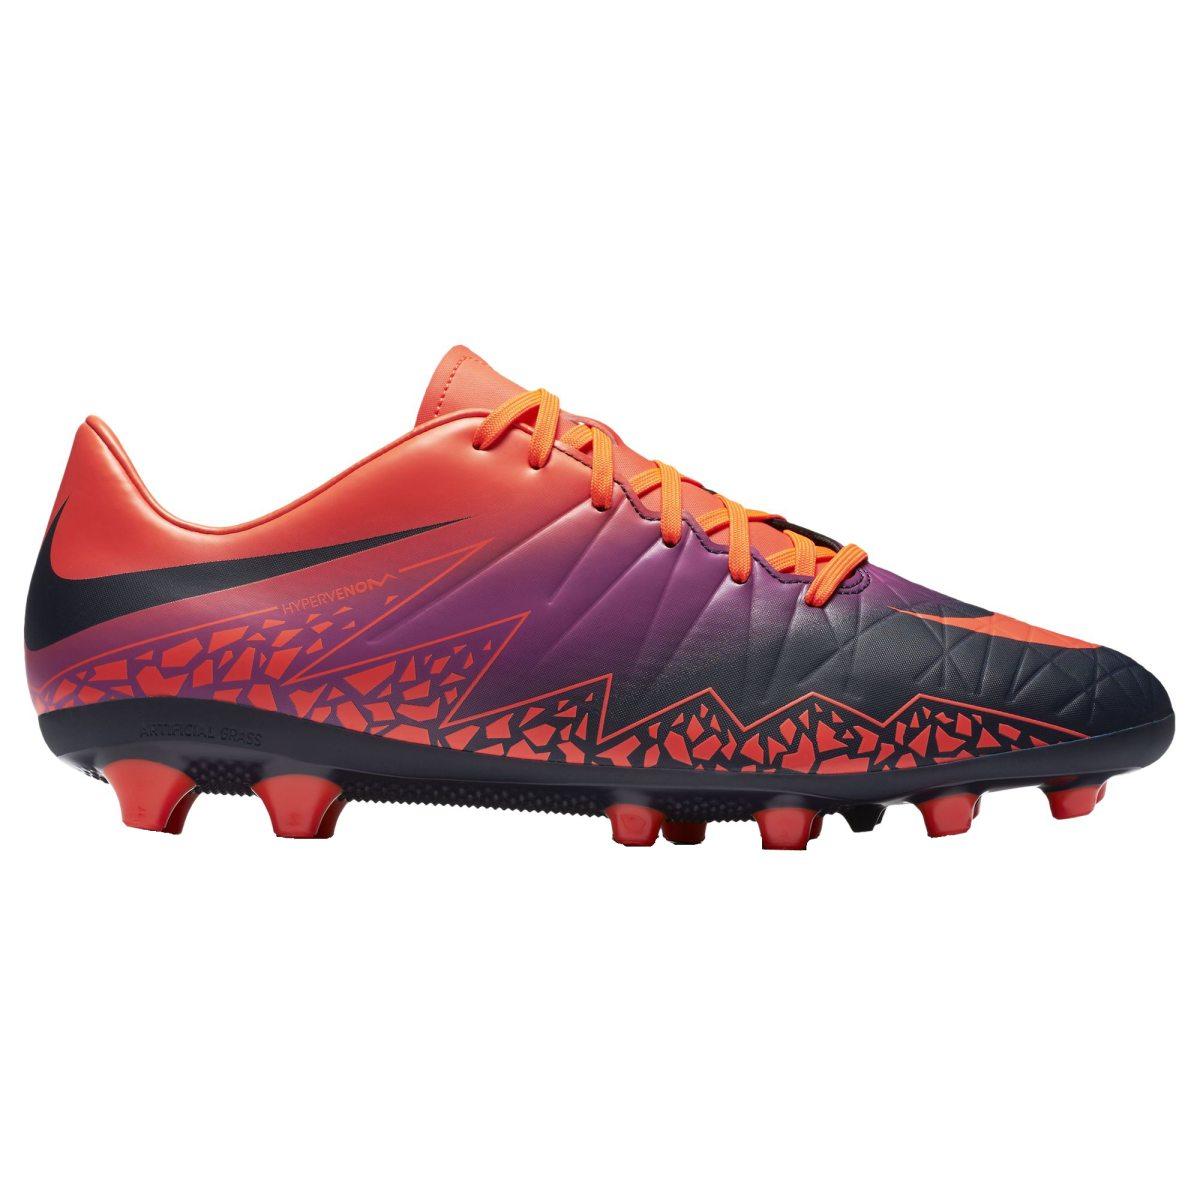 finest selection 9f5c2 bdc22 nike hypervenom phelon ii ag q4 16 fotbollssko senior fotbollsskor